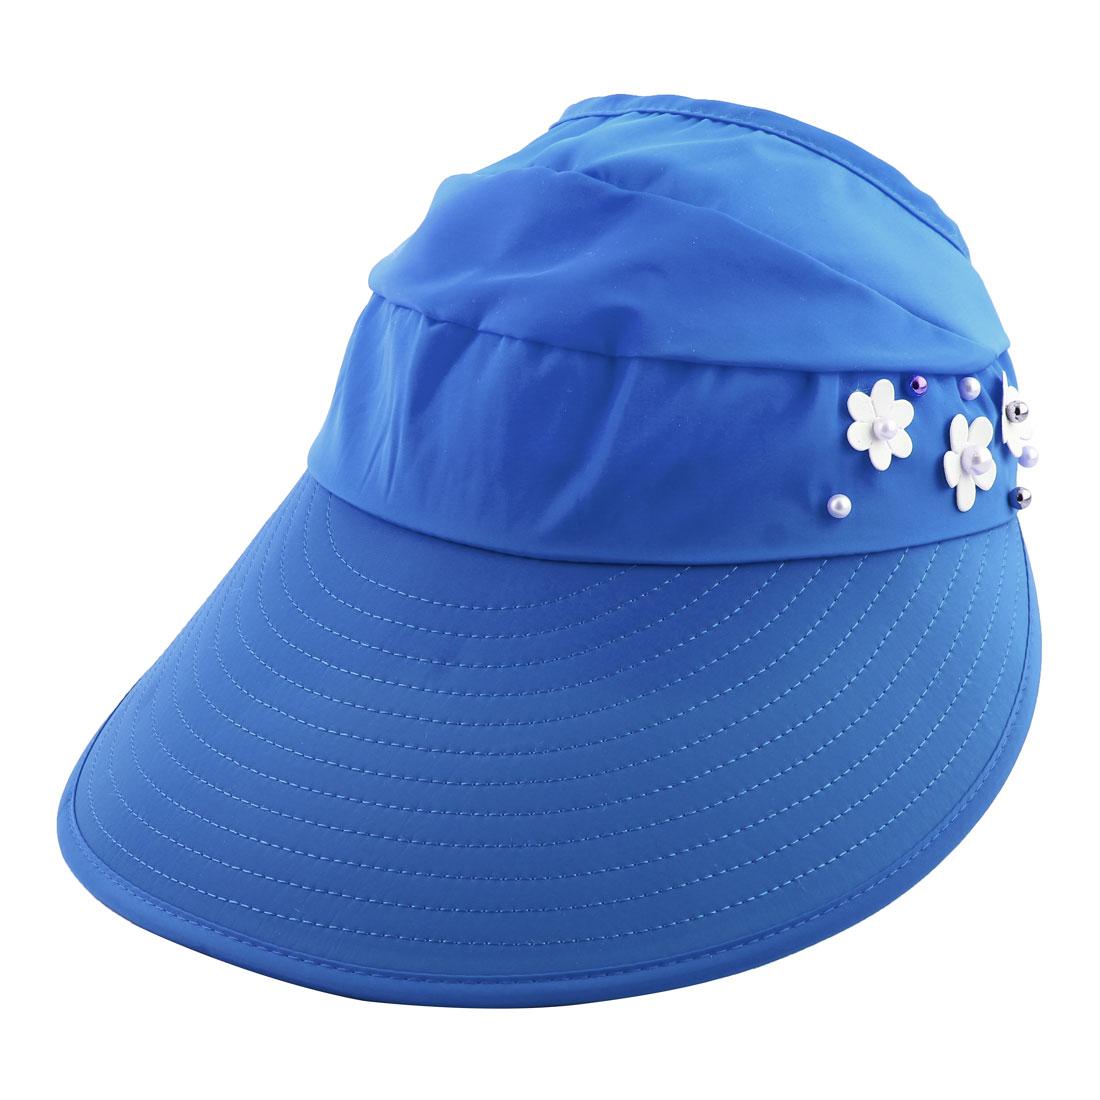 Woman Imitation Pearl Flower Decor Adjustable Summer Beach Floppy Cap Sun Visor Hat Blue